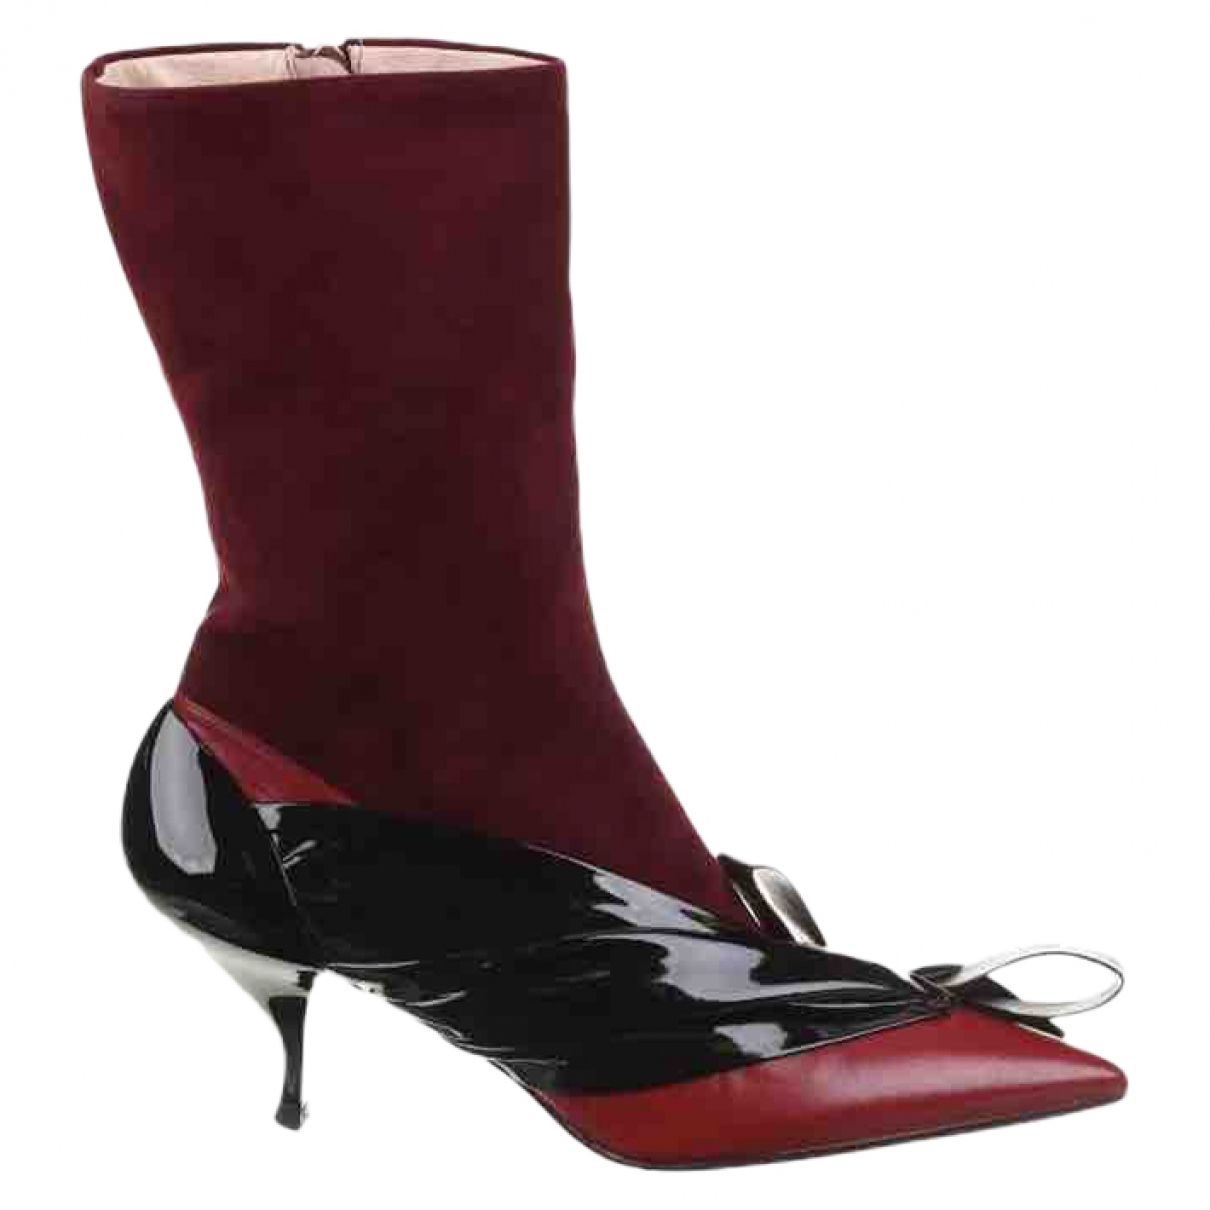 Miu Miu - Boots   pour femme en cuir - bordeaux